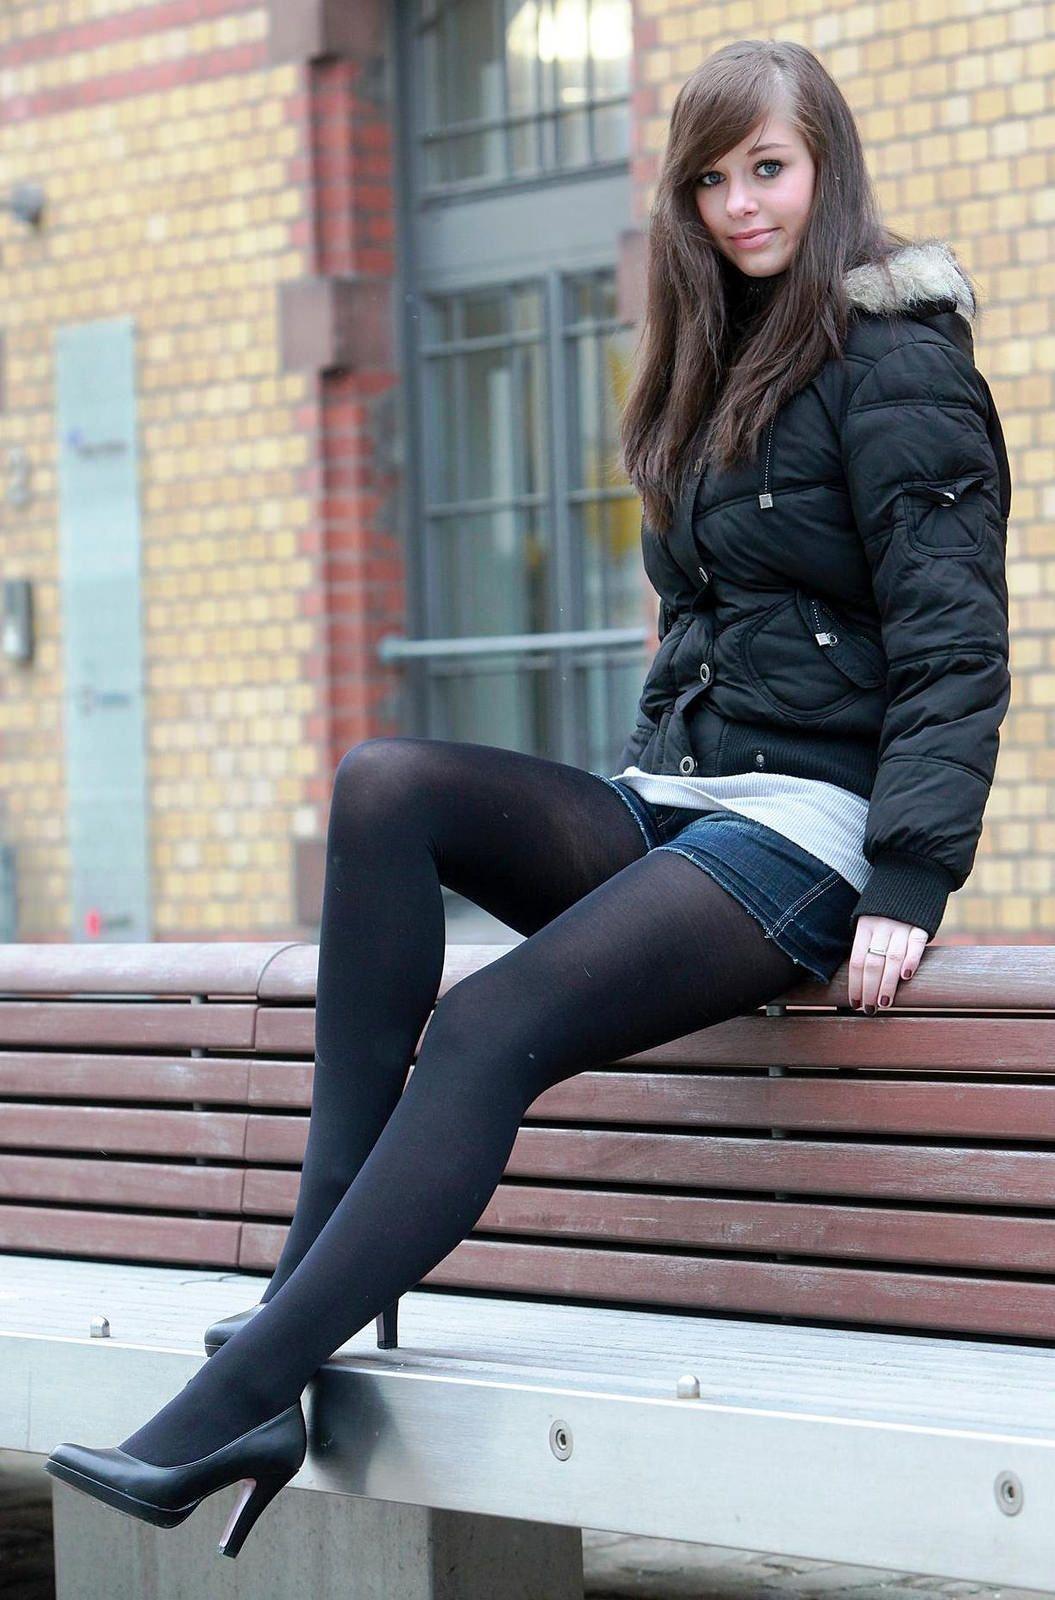 Pics pantyhose teen Suspender Pantyhose,